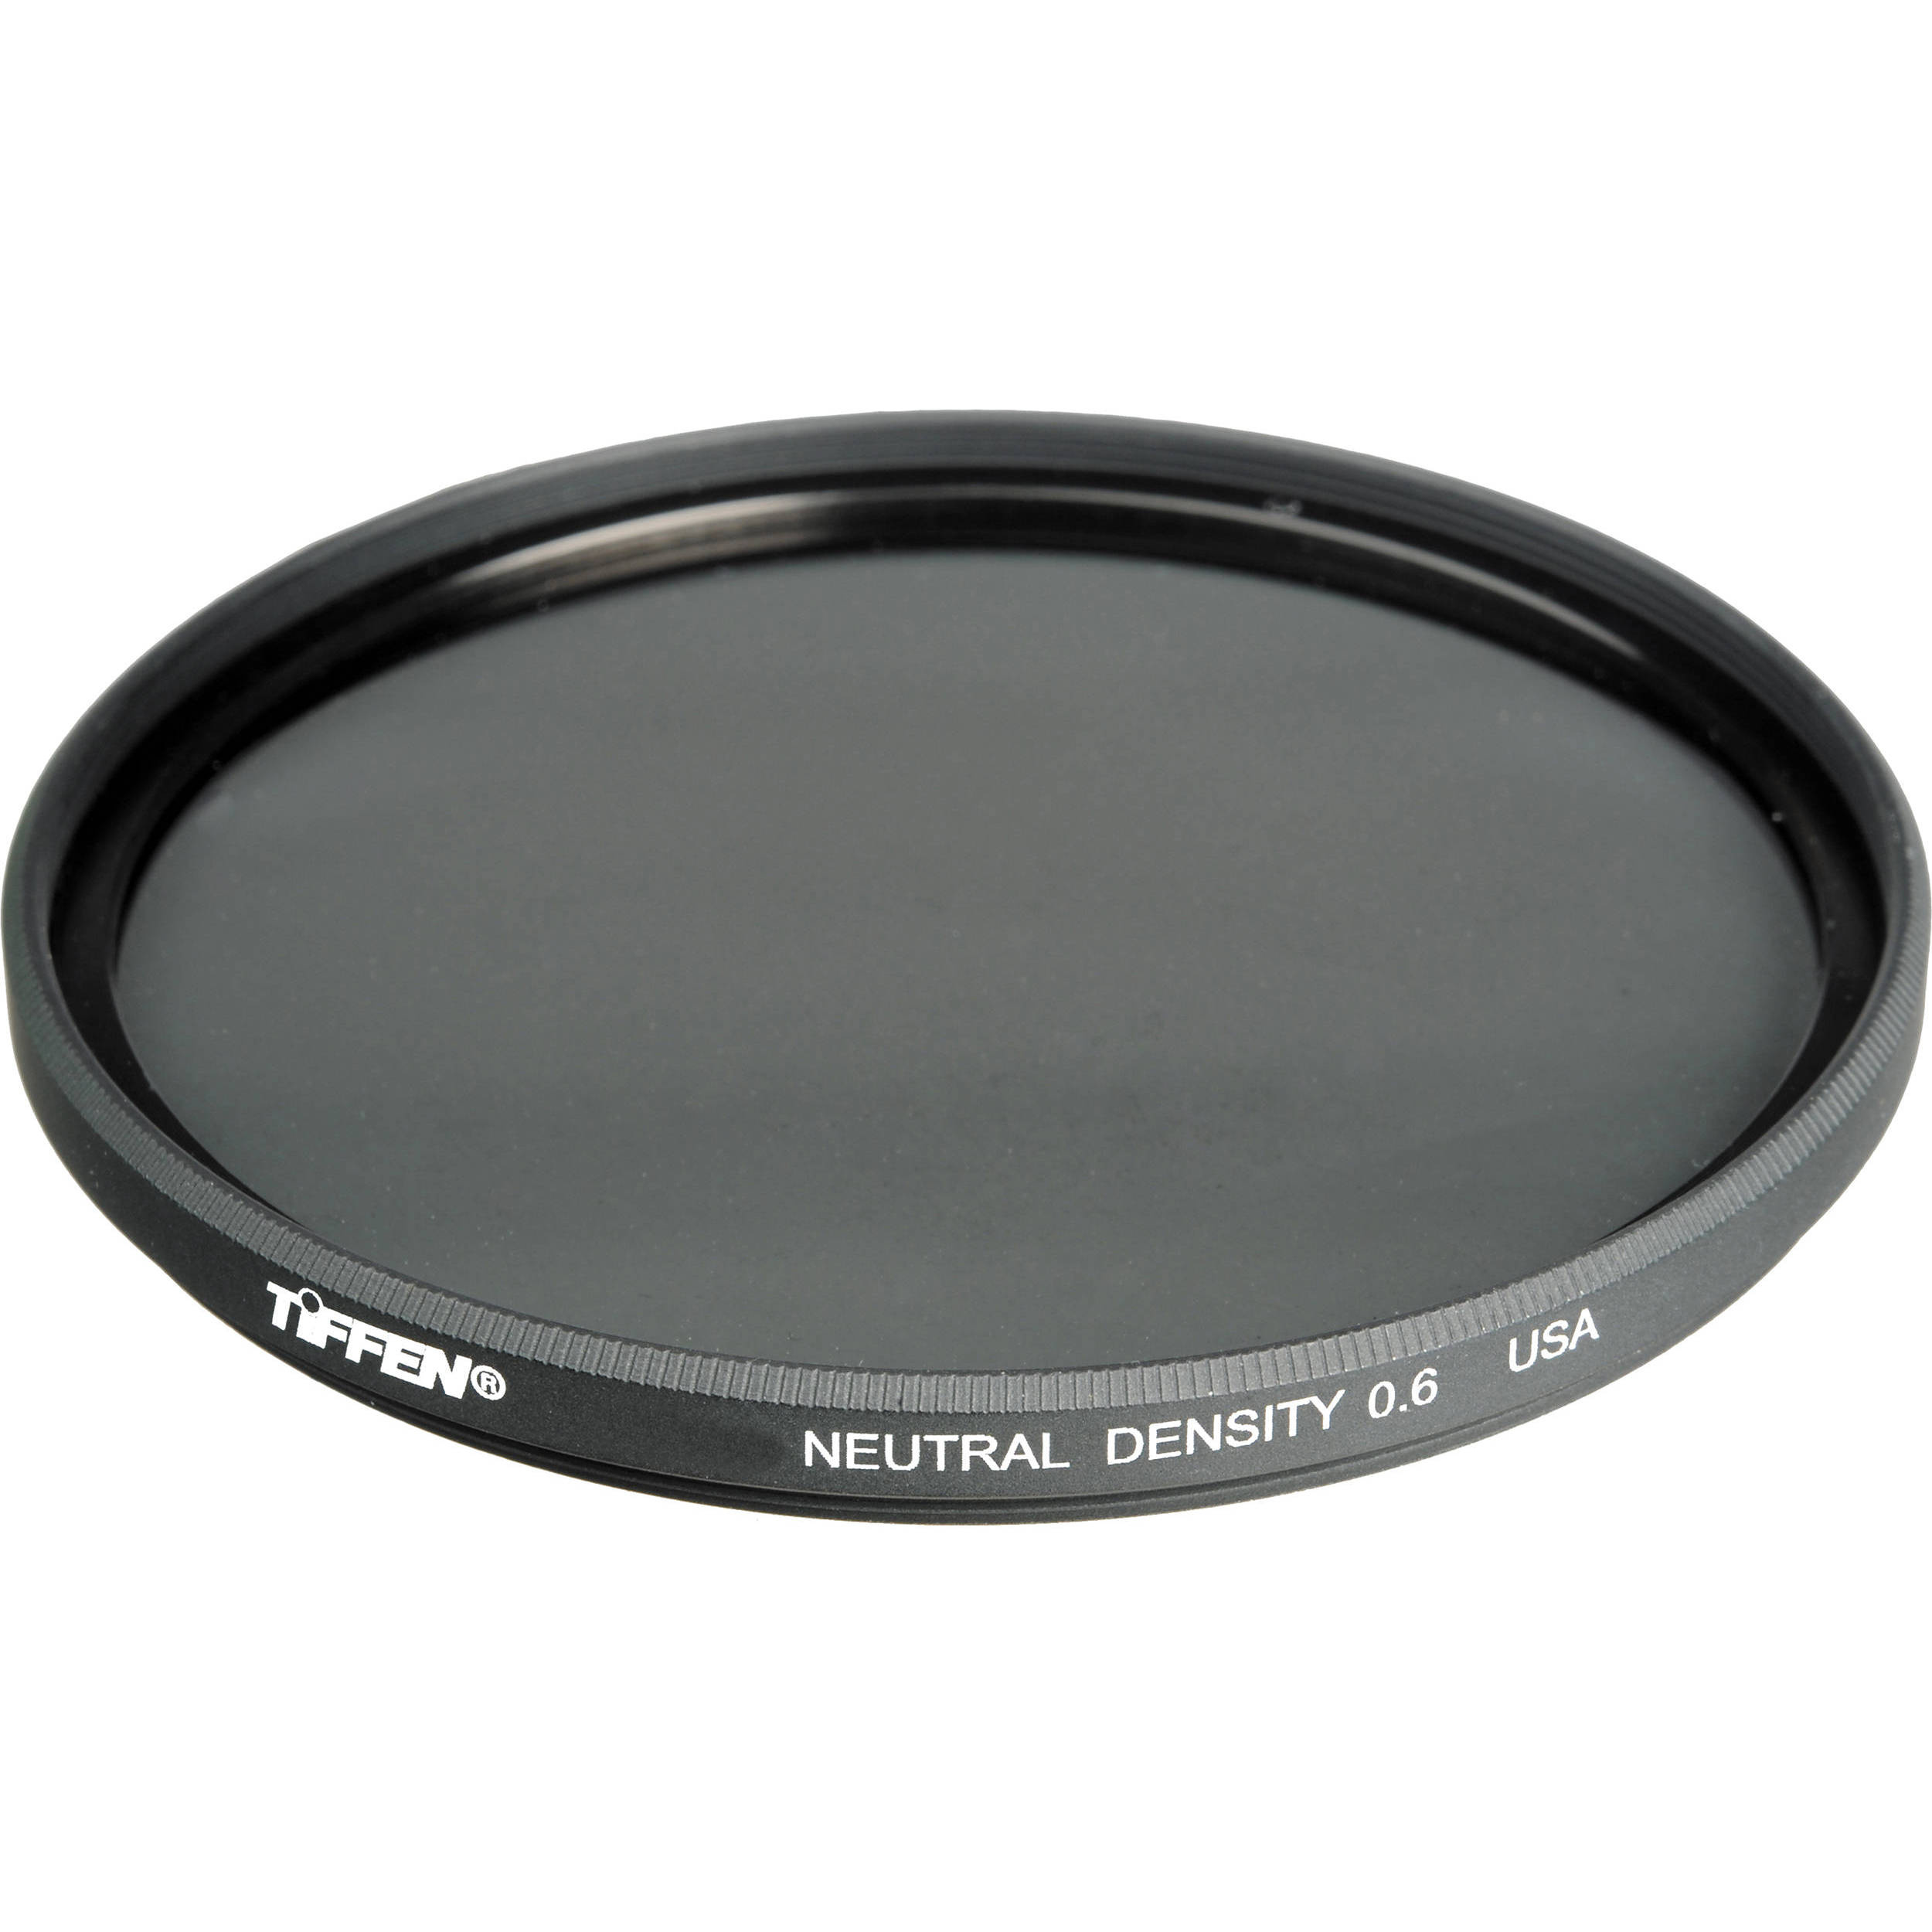 Tiffen 52mm Neutral Density (ND) Filter 0.6